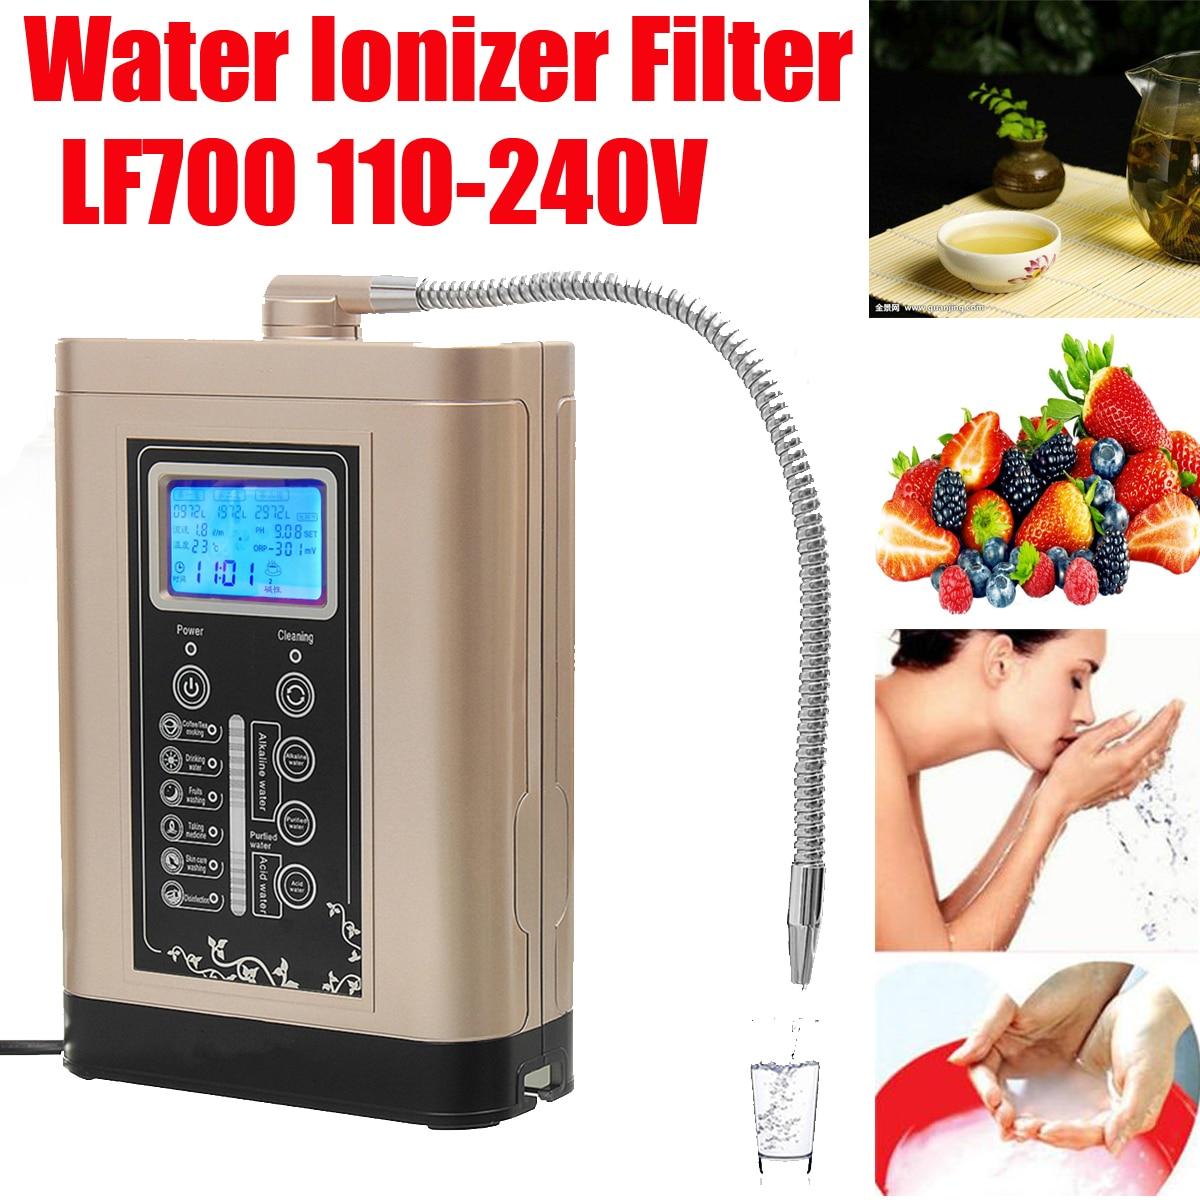 110-240 v Acciaio Inox LF700 Acqua Ionizzatore Purificatore LCD Tou. ch Controllo PH Acido Alcalina Regolare Macchina AU/US/EU Plug